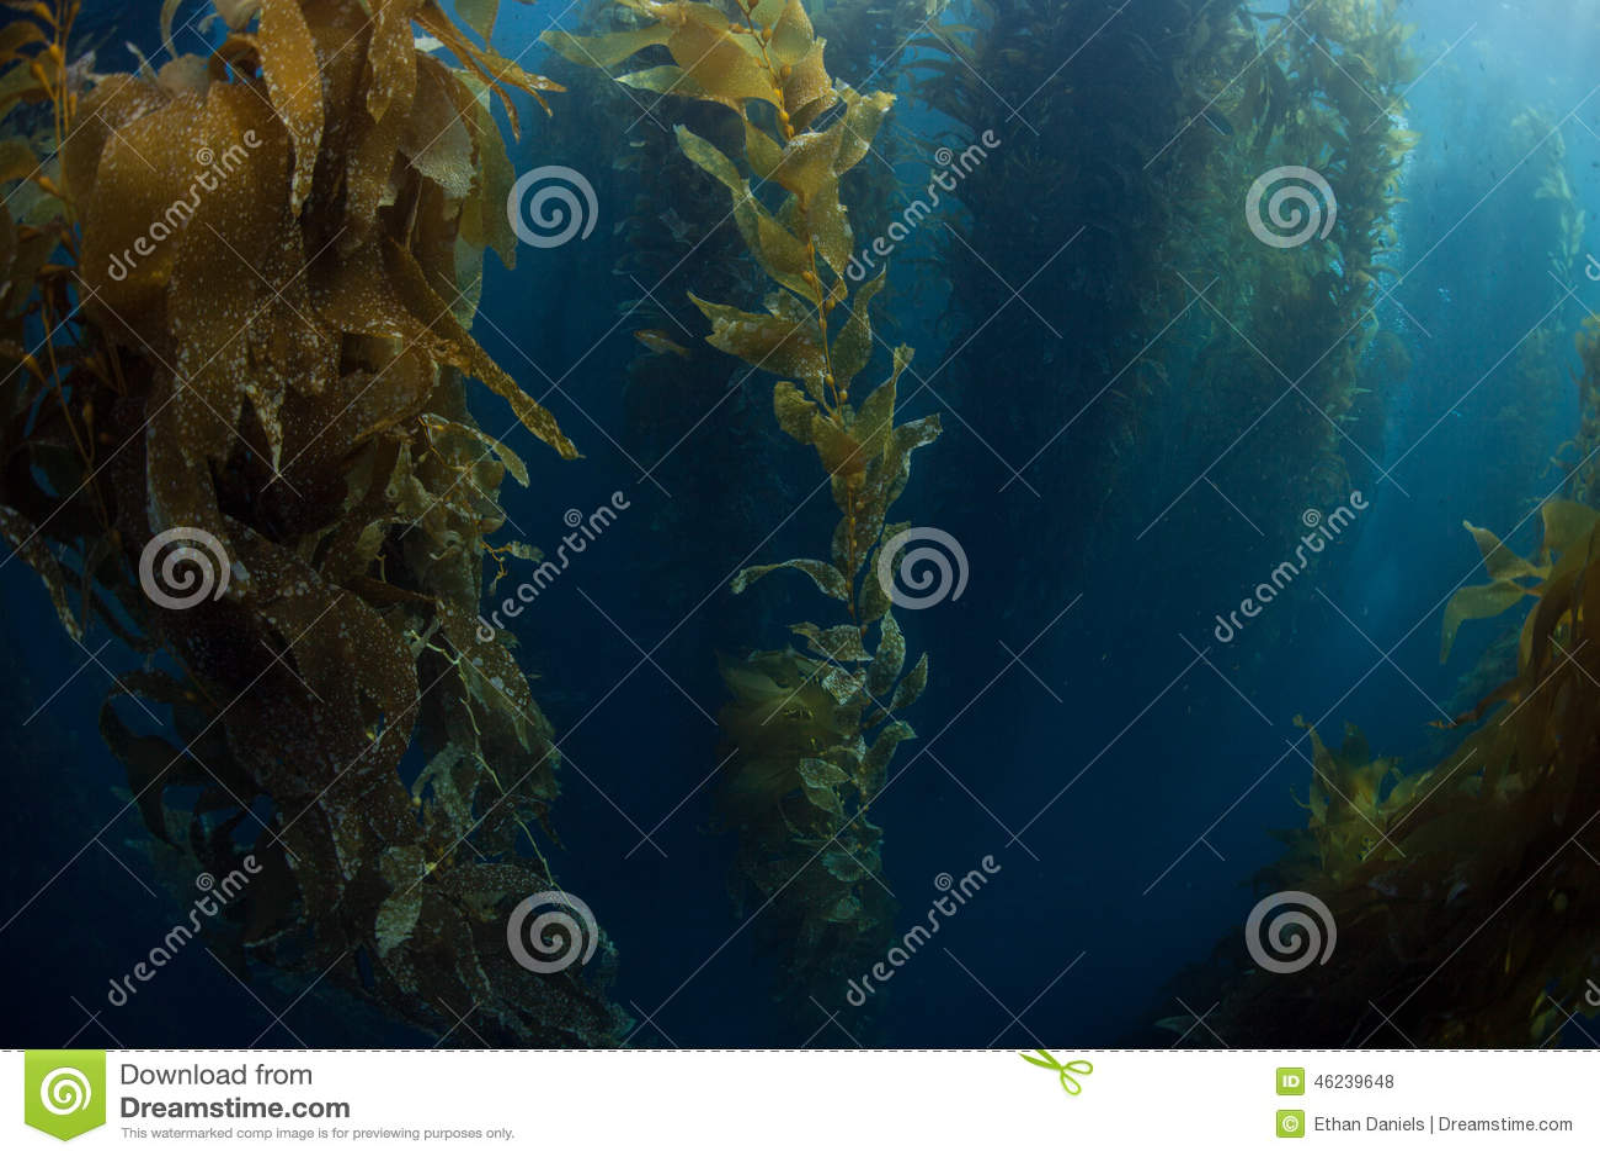 Giant Kelp Growing